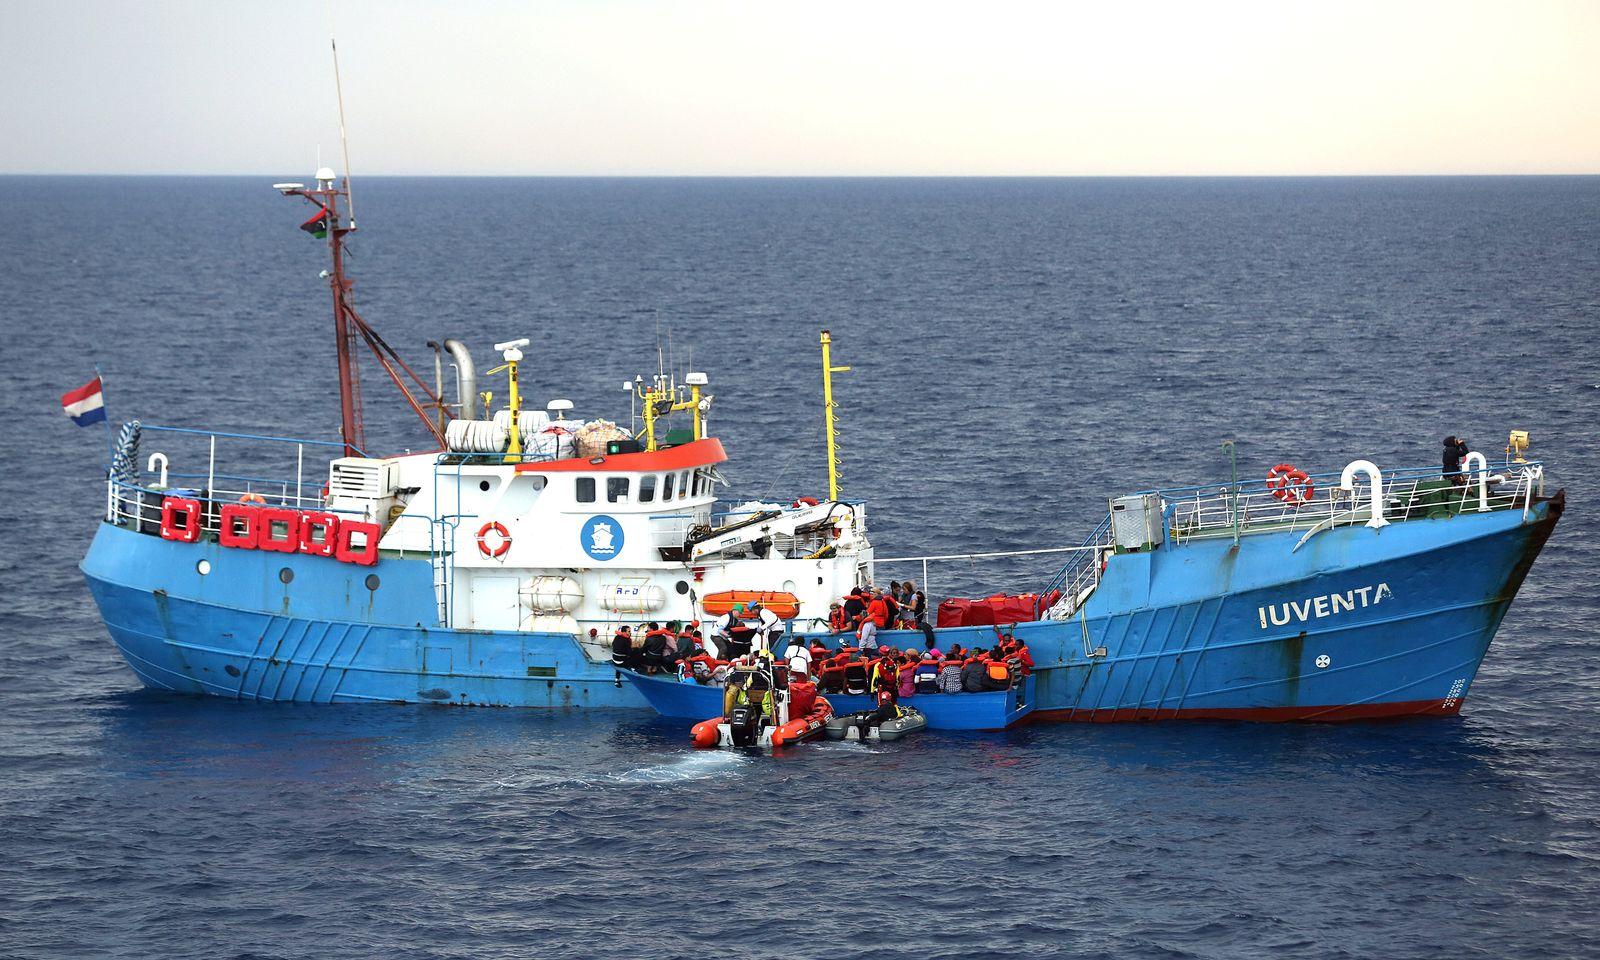 Jugend Rettet/ EUROPE-MIGRANTS/ITALY-NGO